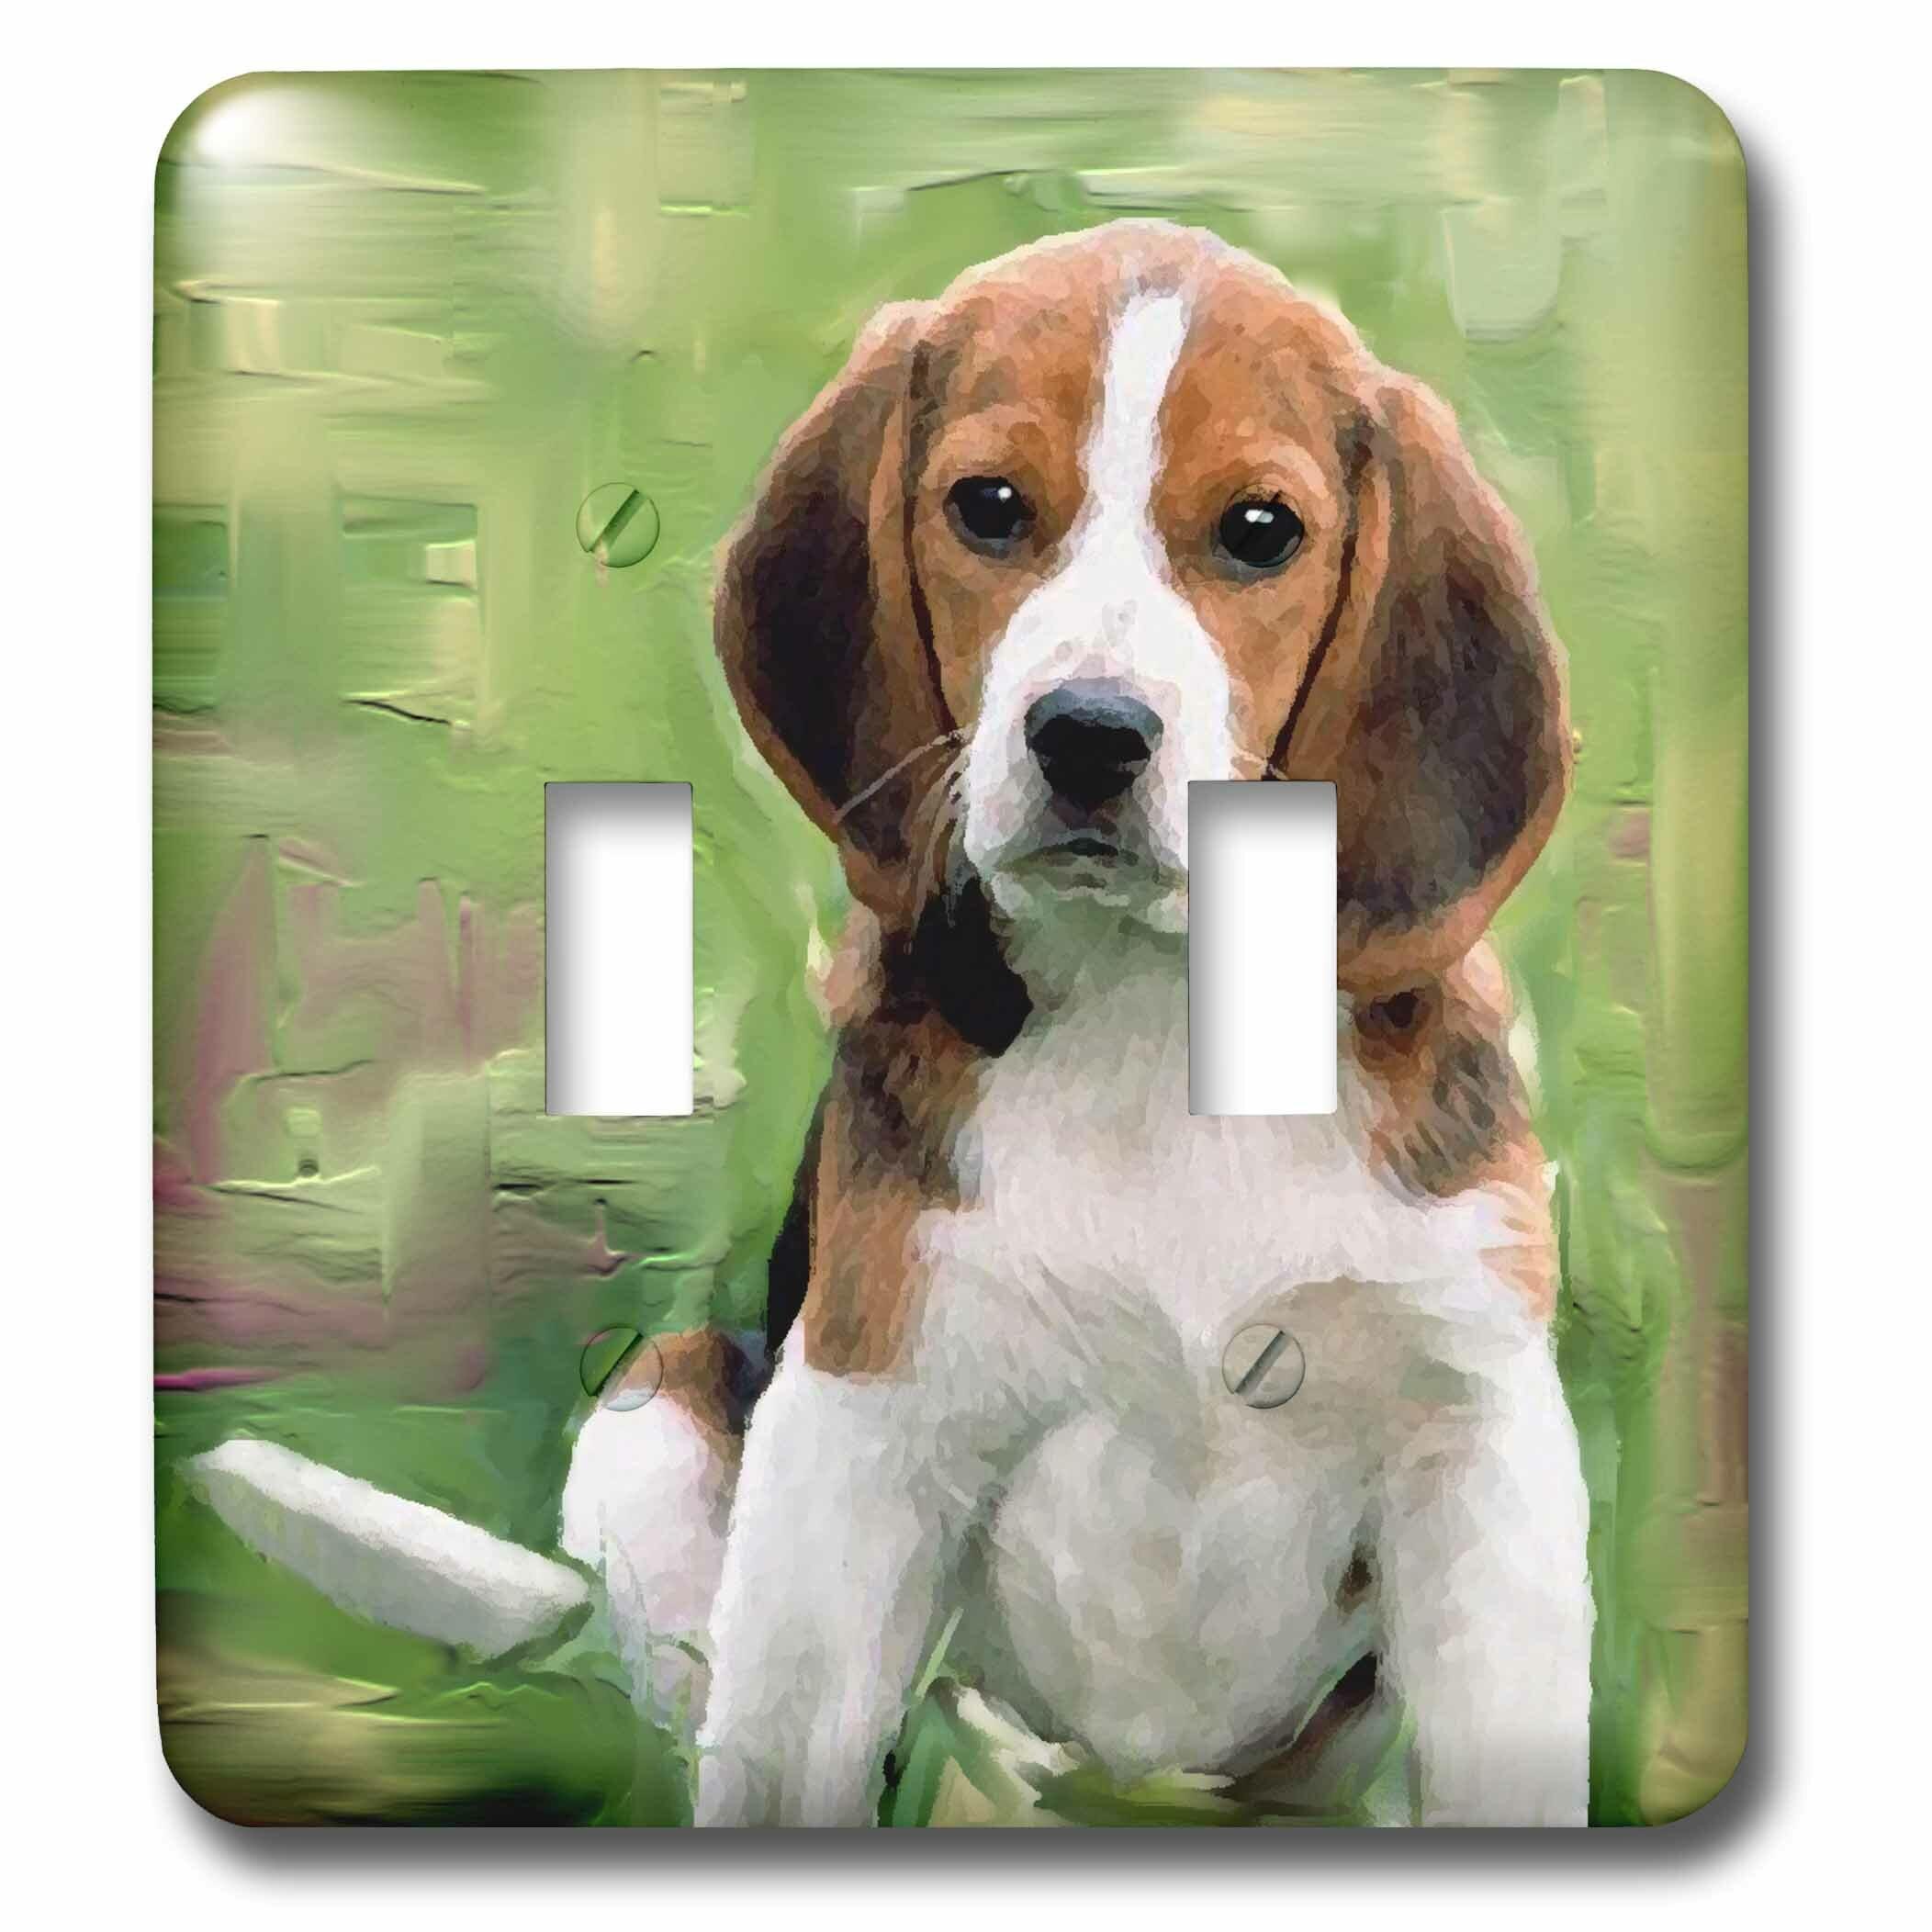 3drose Beagle Puppy 2 Gang Toggle Light Switch Wall Plate Wayfair